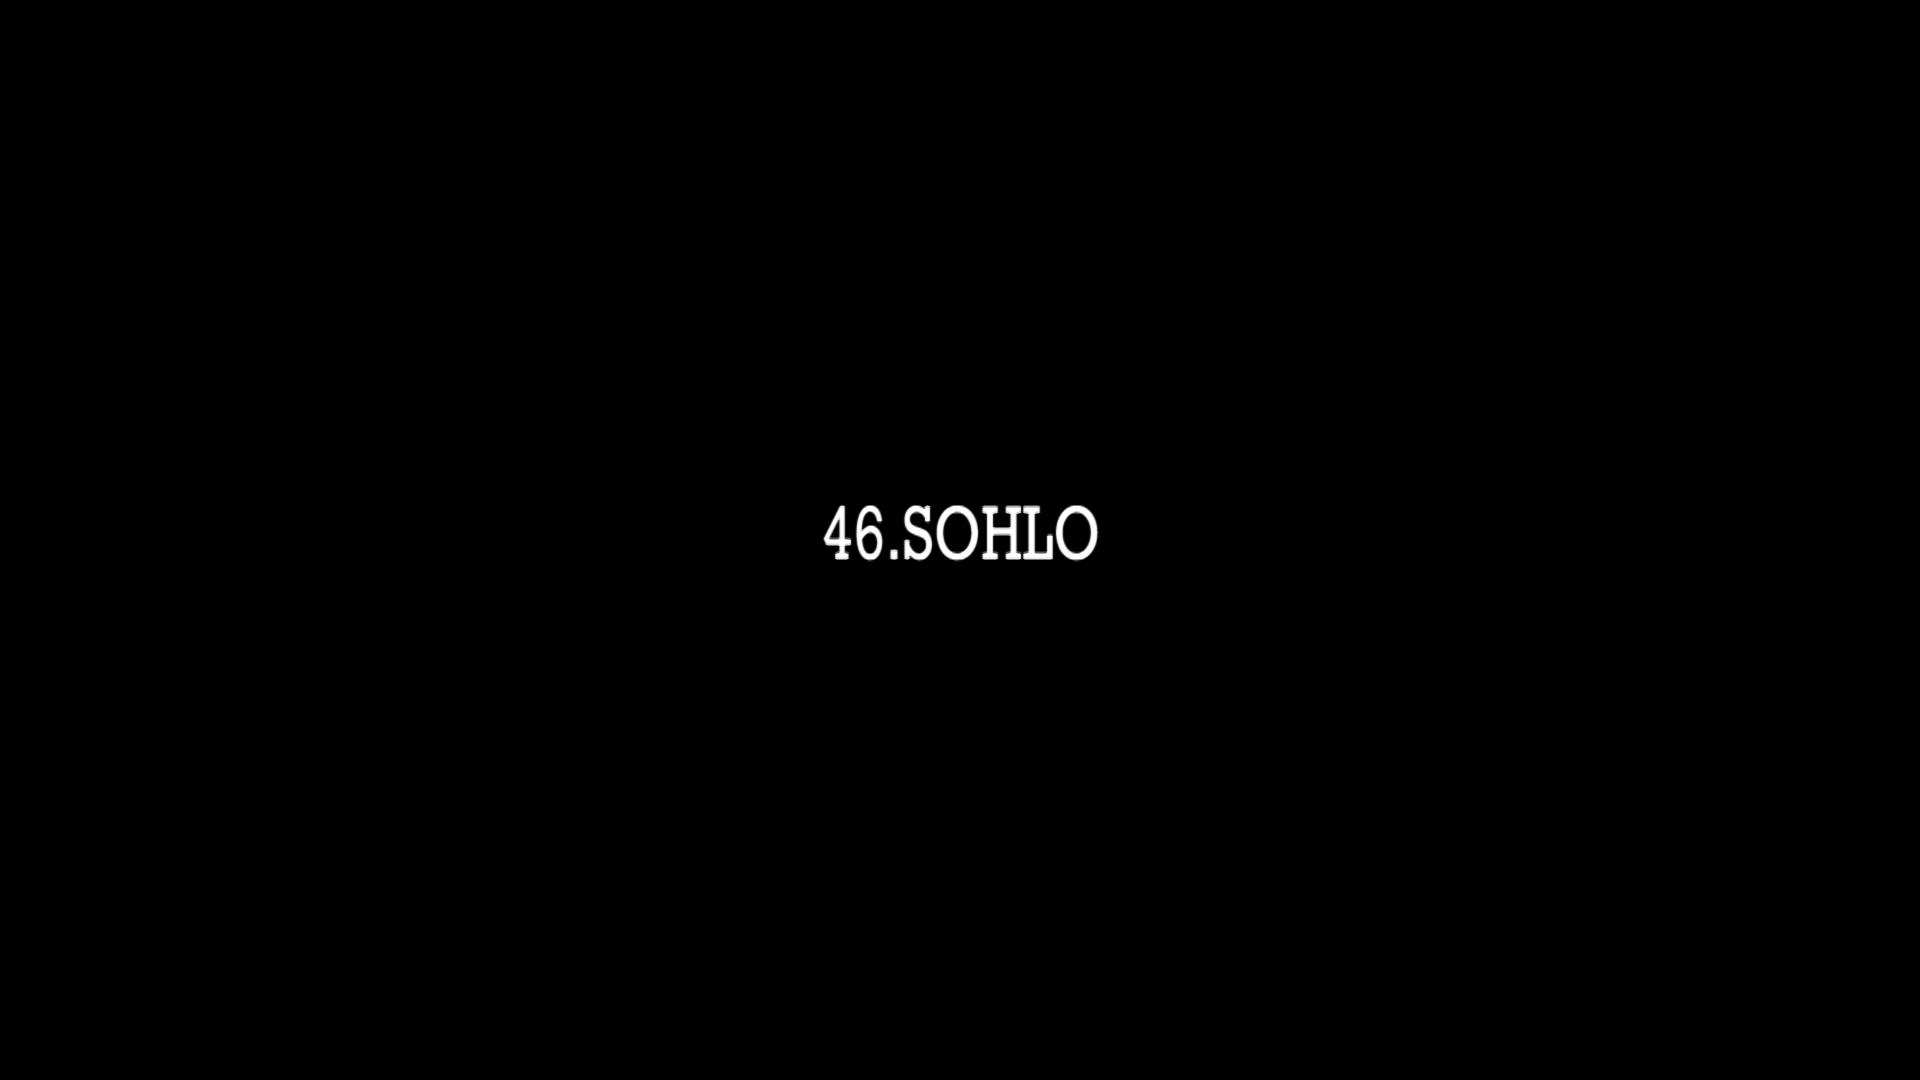 46.sohlo